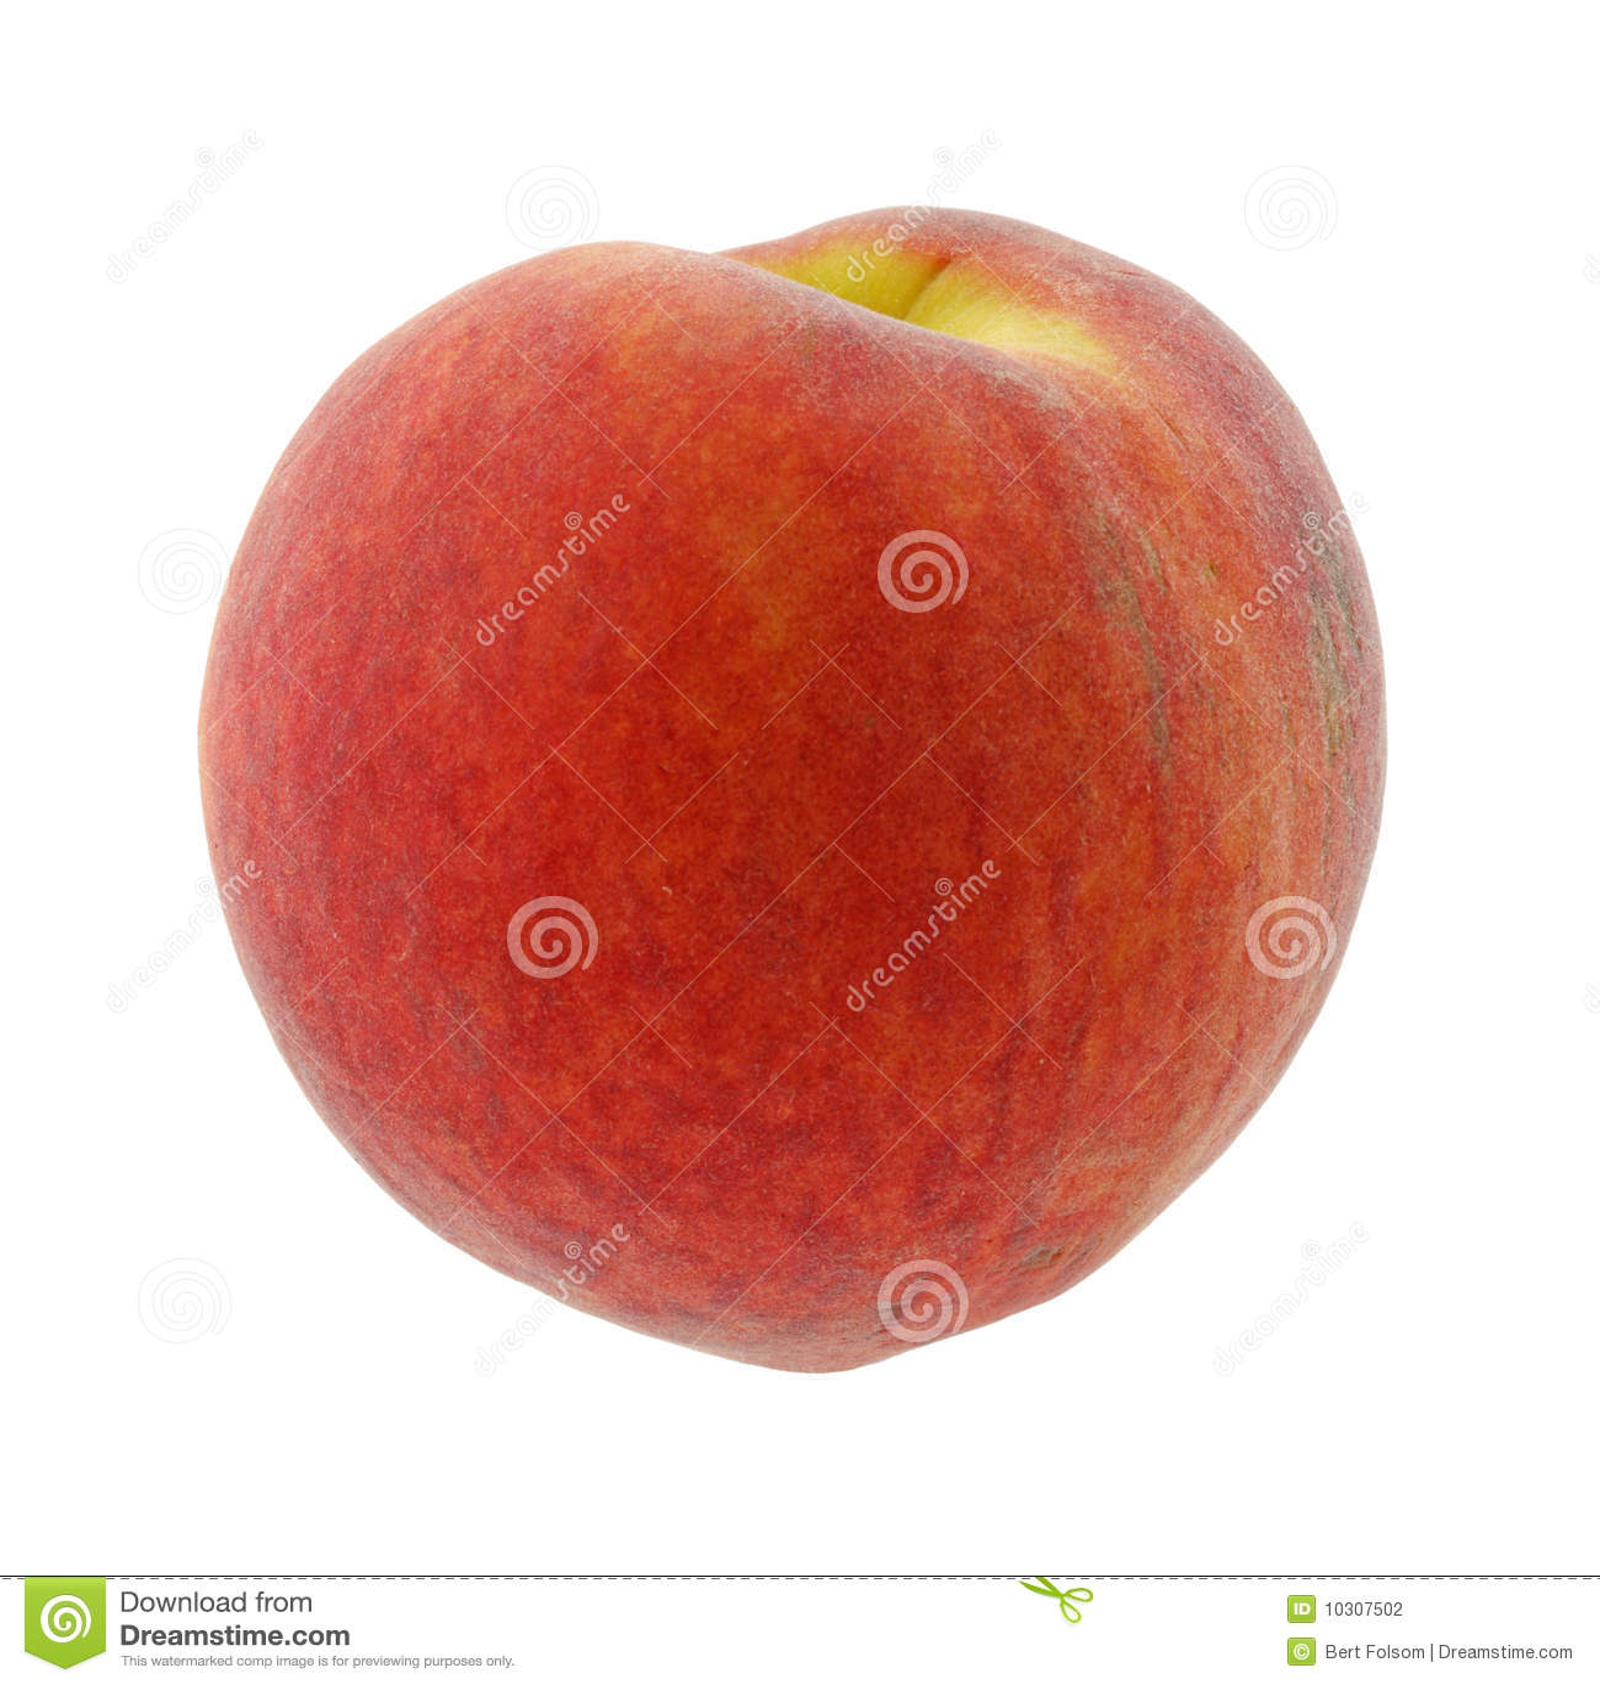 Singles in peach glen